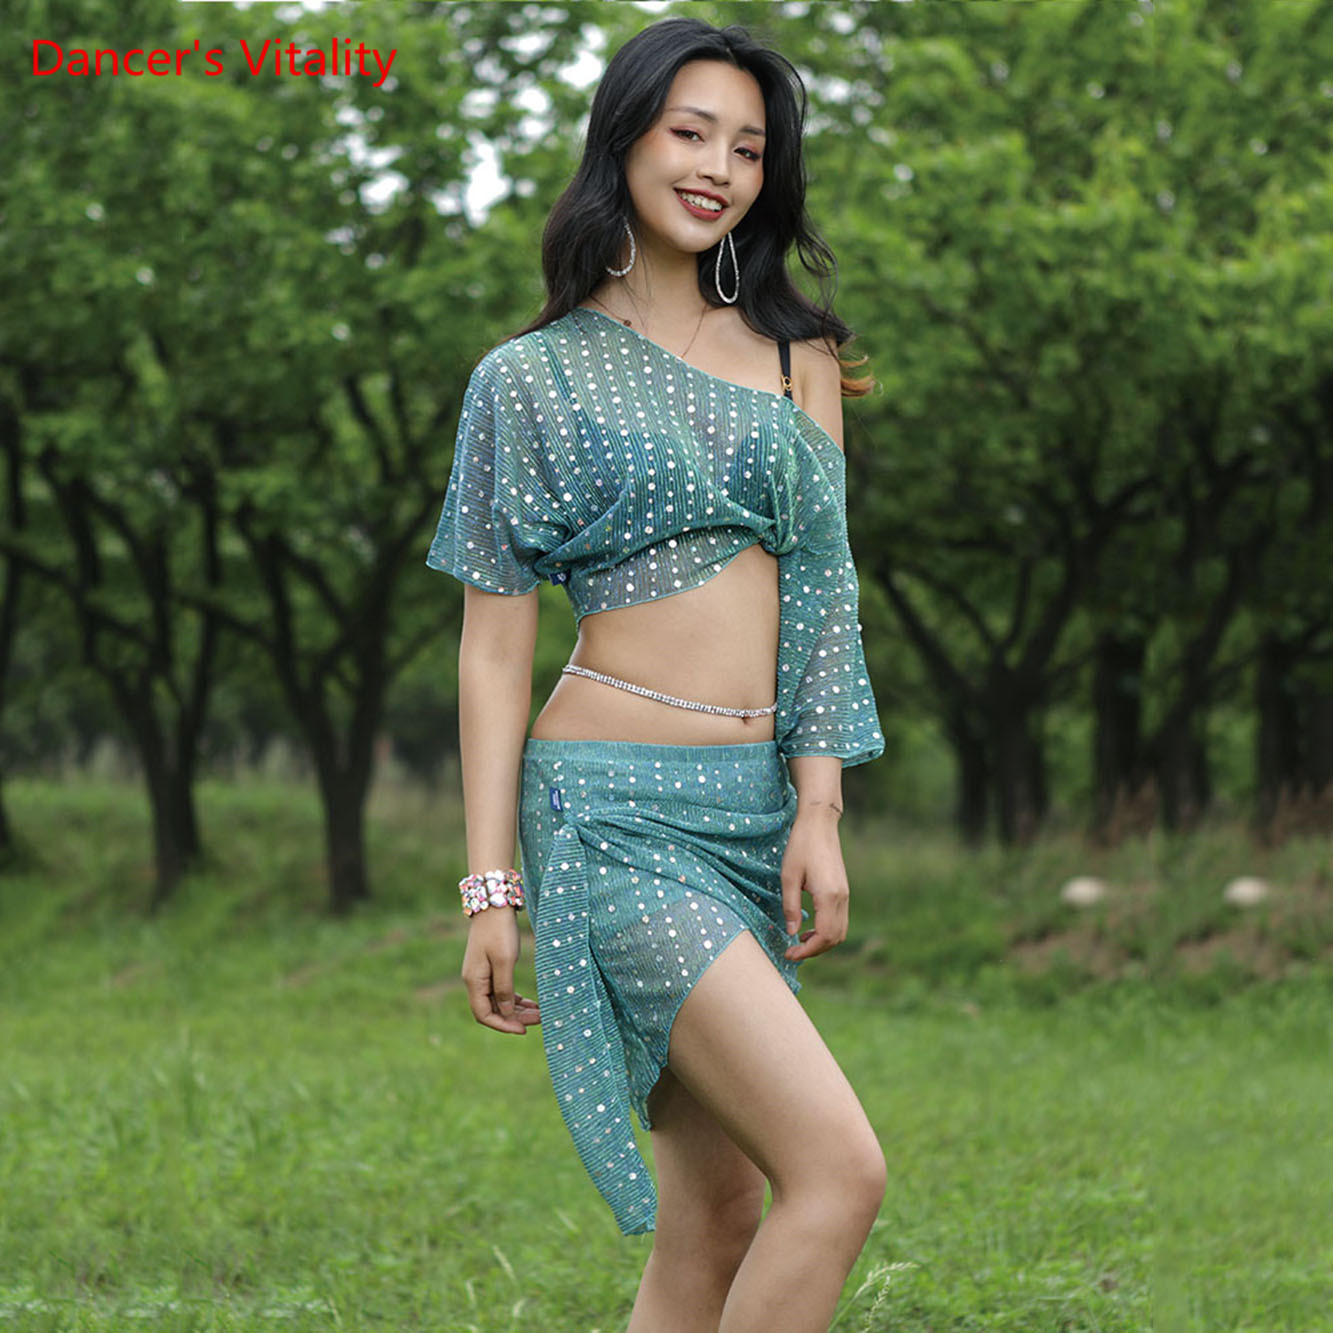 New Adult Belly Dance Oriental Dance Costume 2 Piece Bellydance Bling Bling Dancer Skirt Loose Top Practice Daily Wear